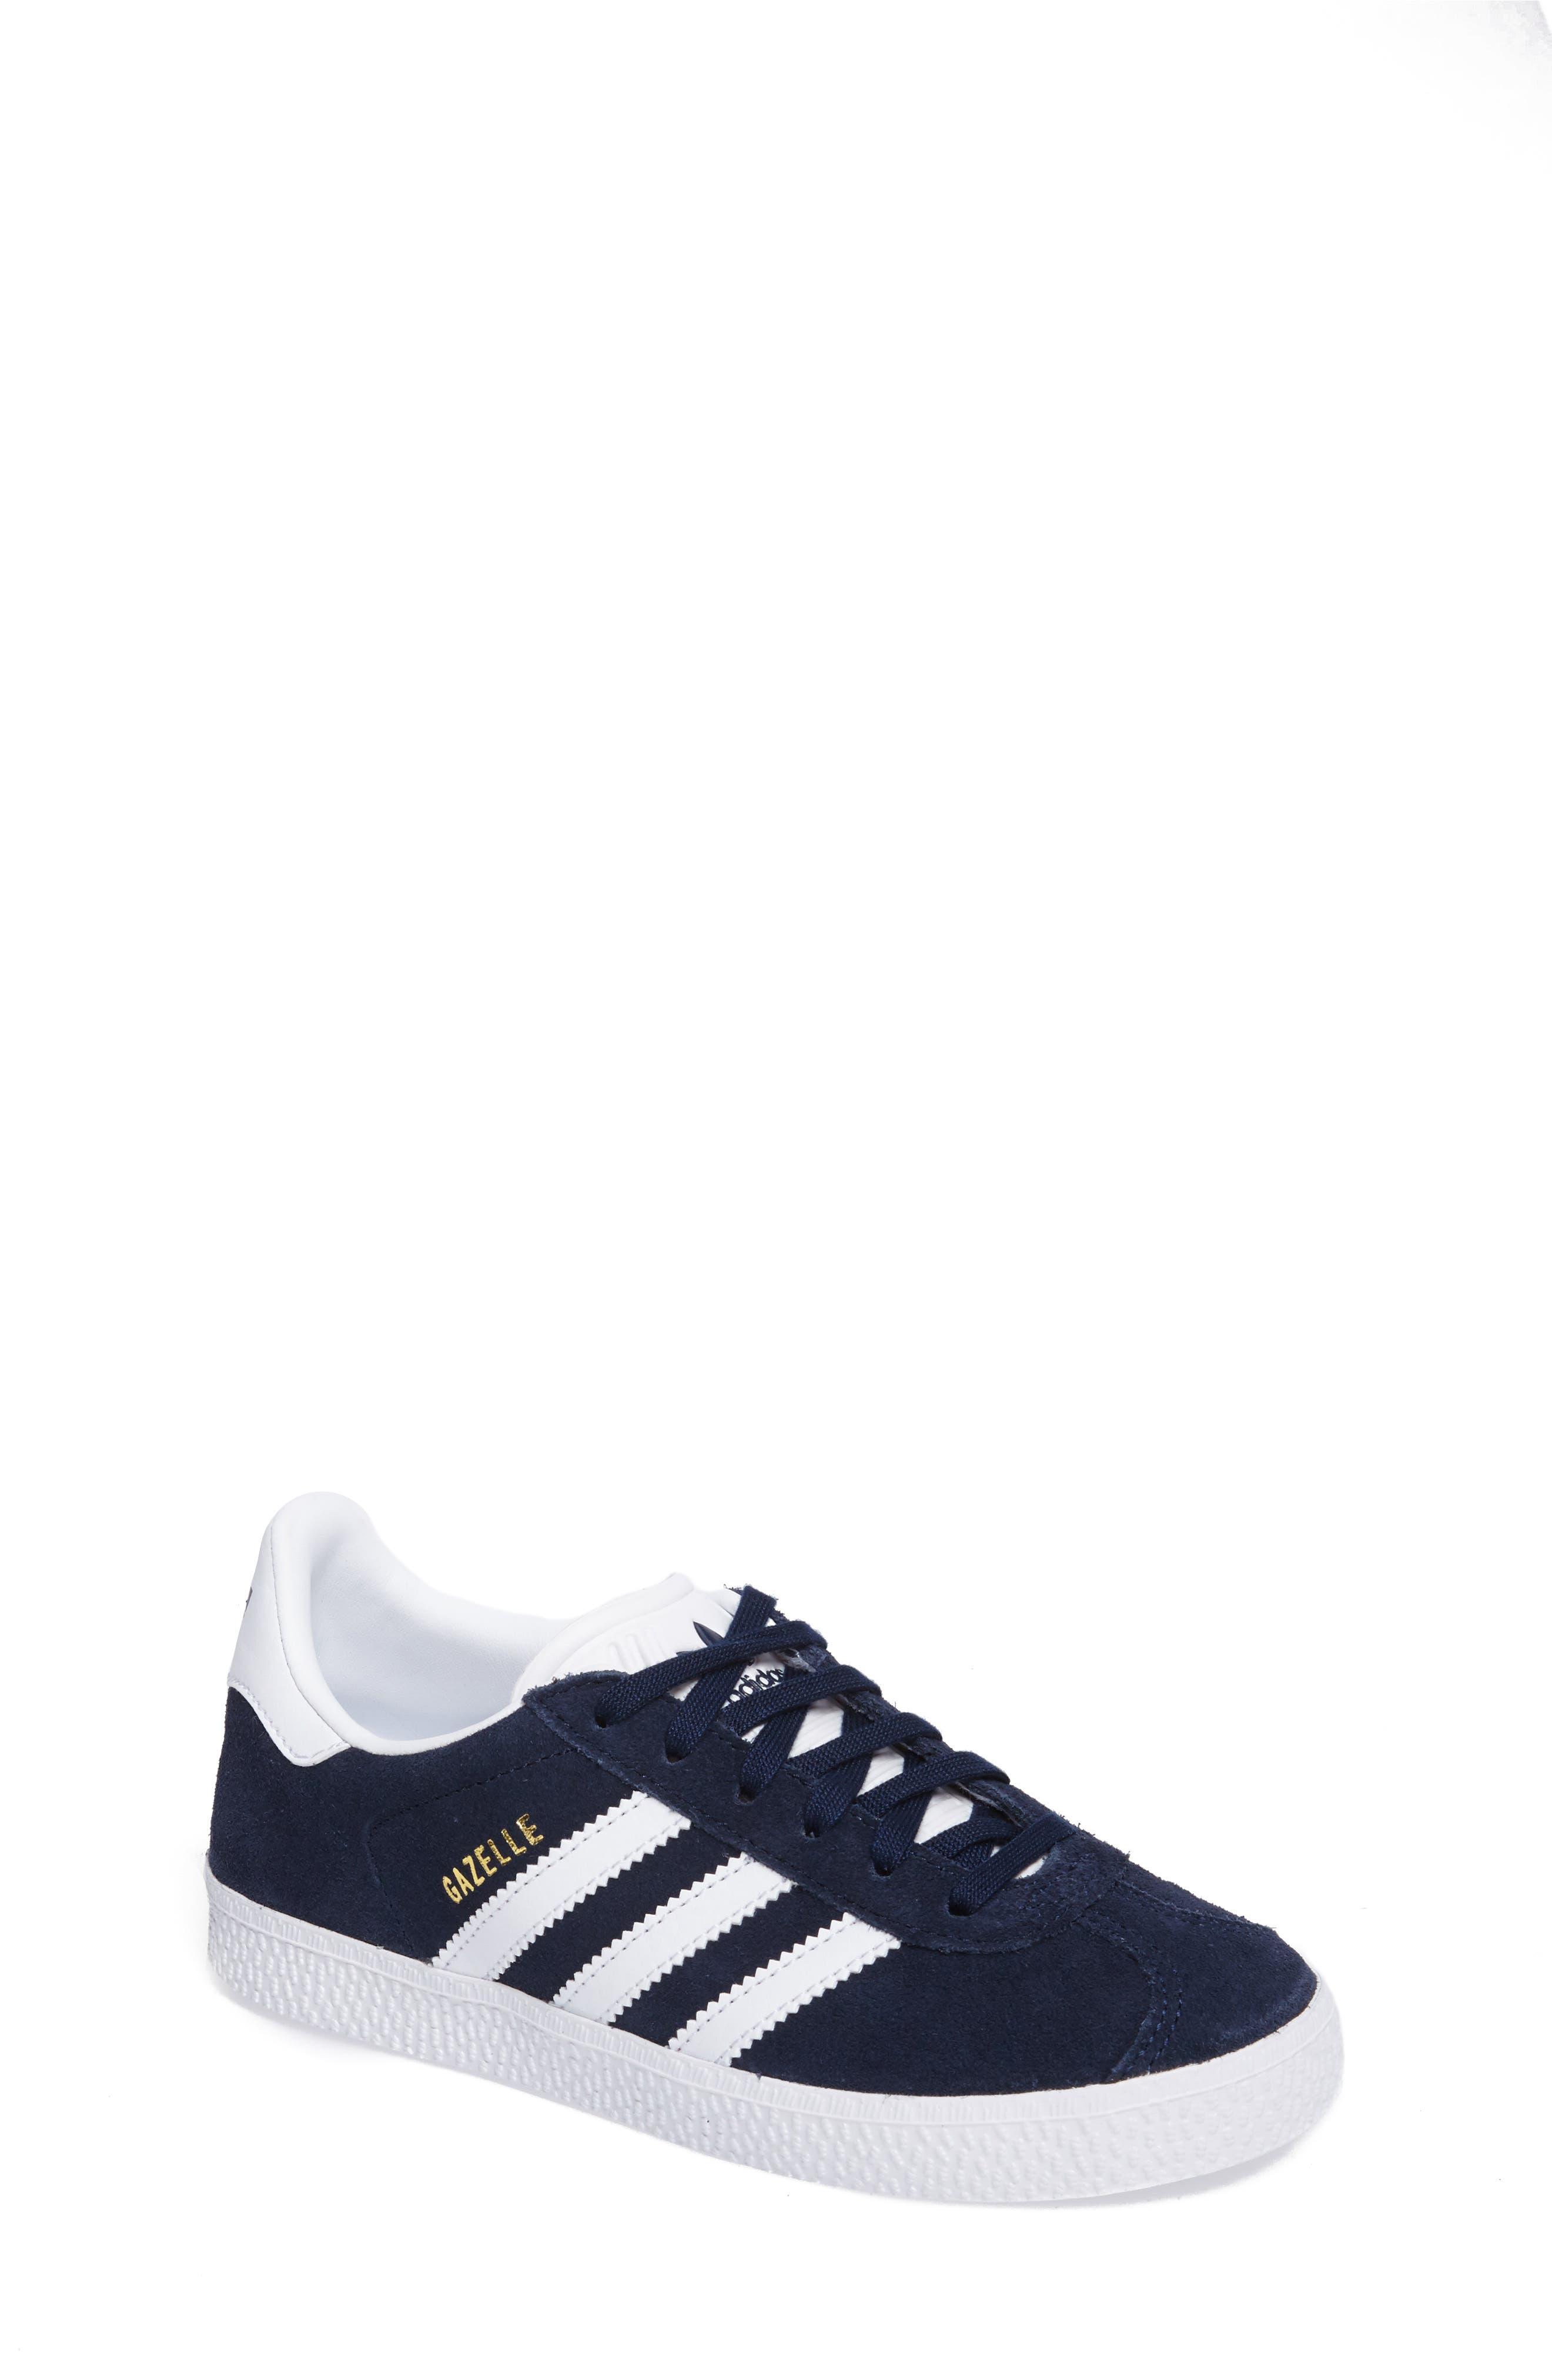 Toddler Adidas Gazelle Sneaker Size 125 M  Blue